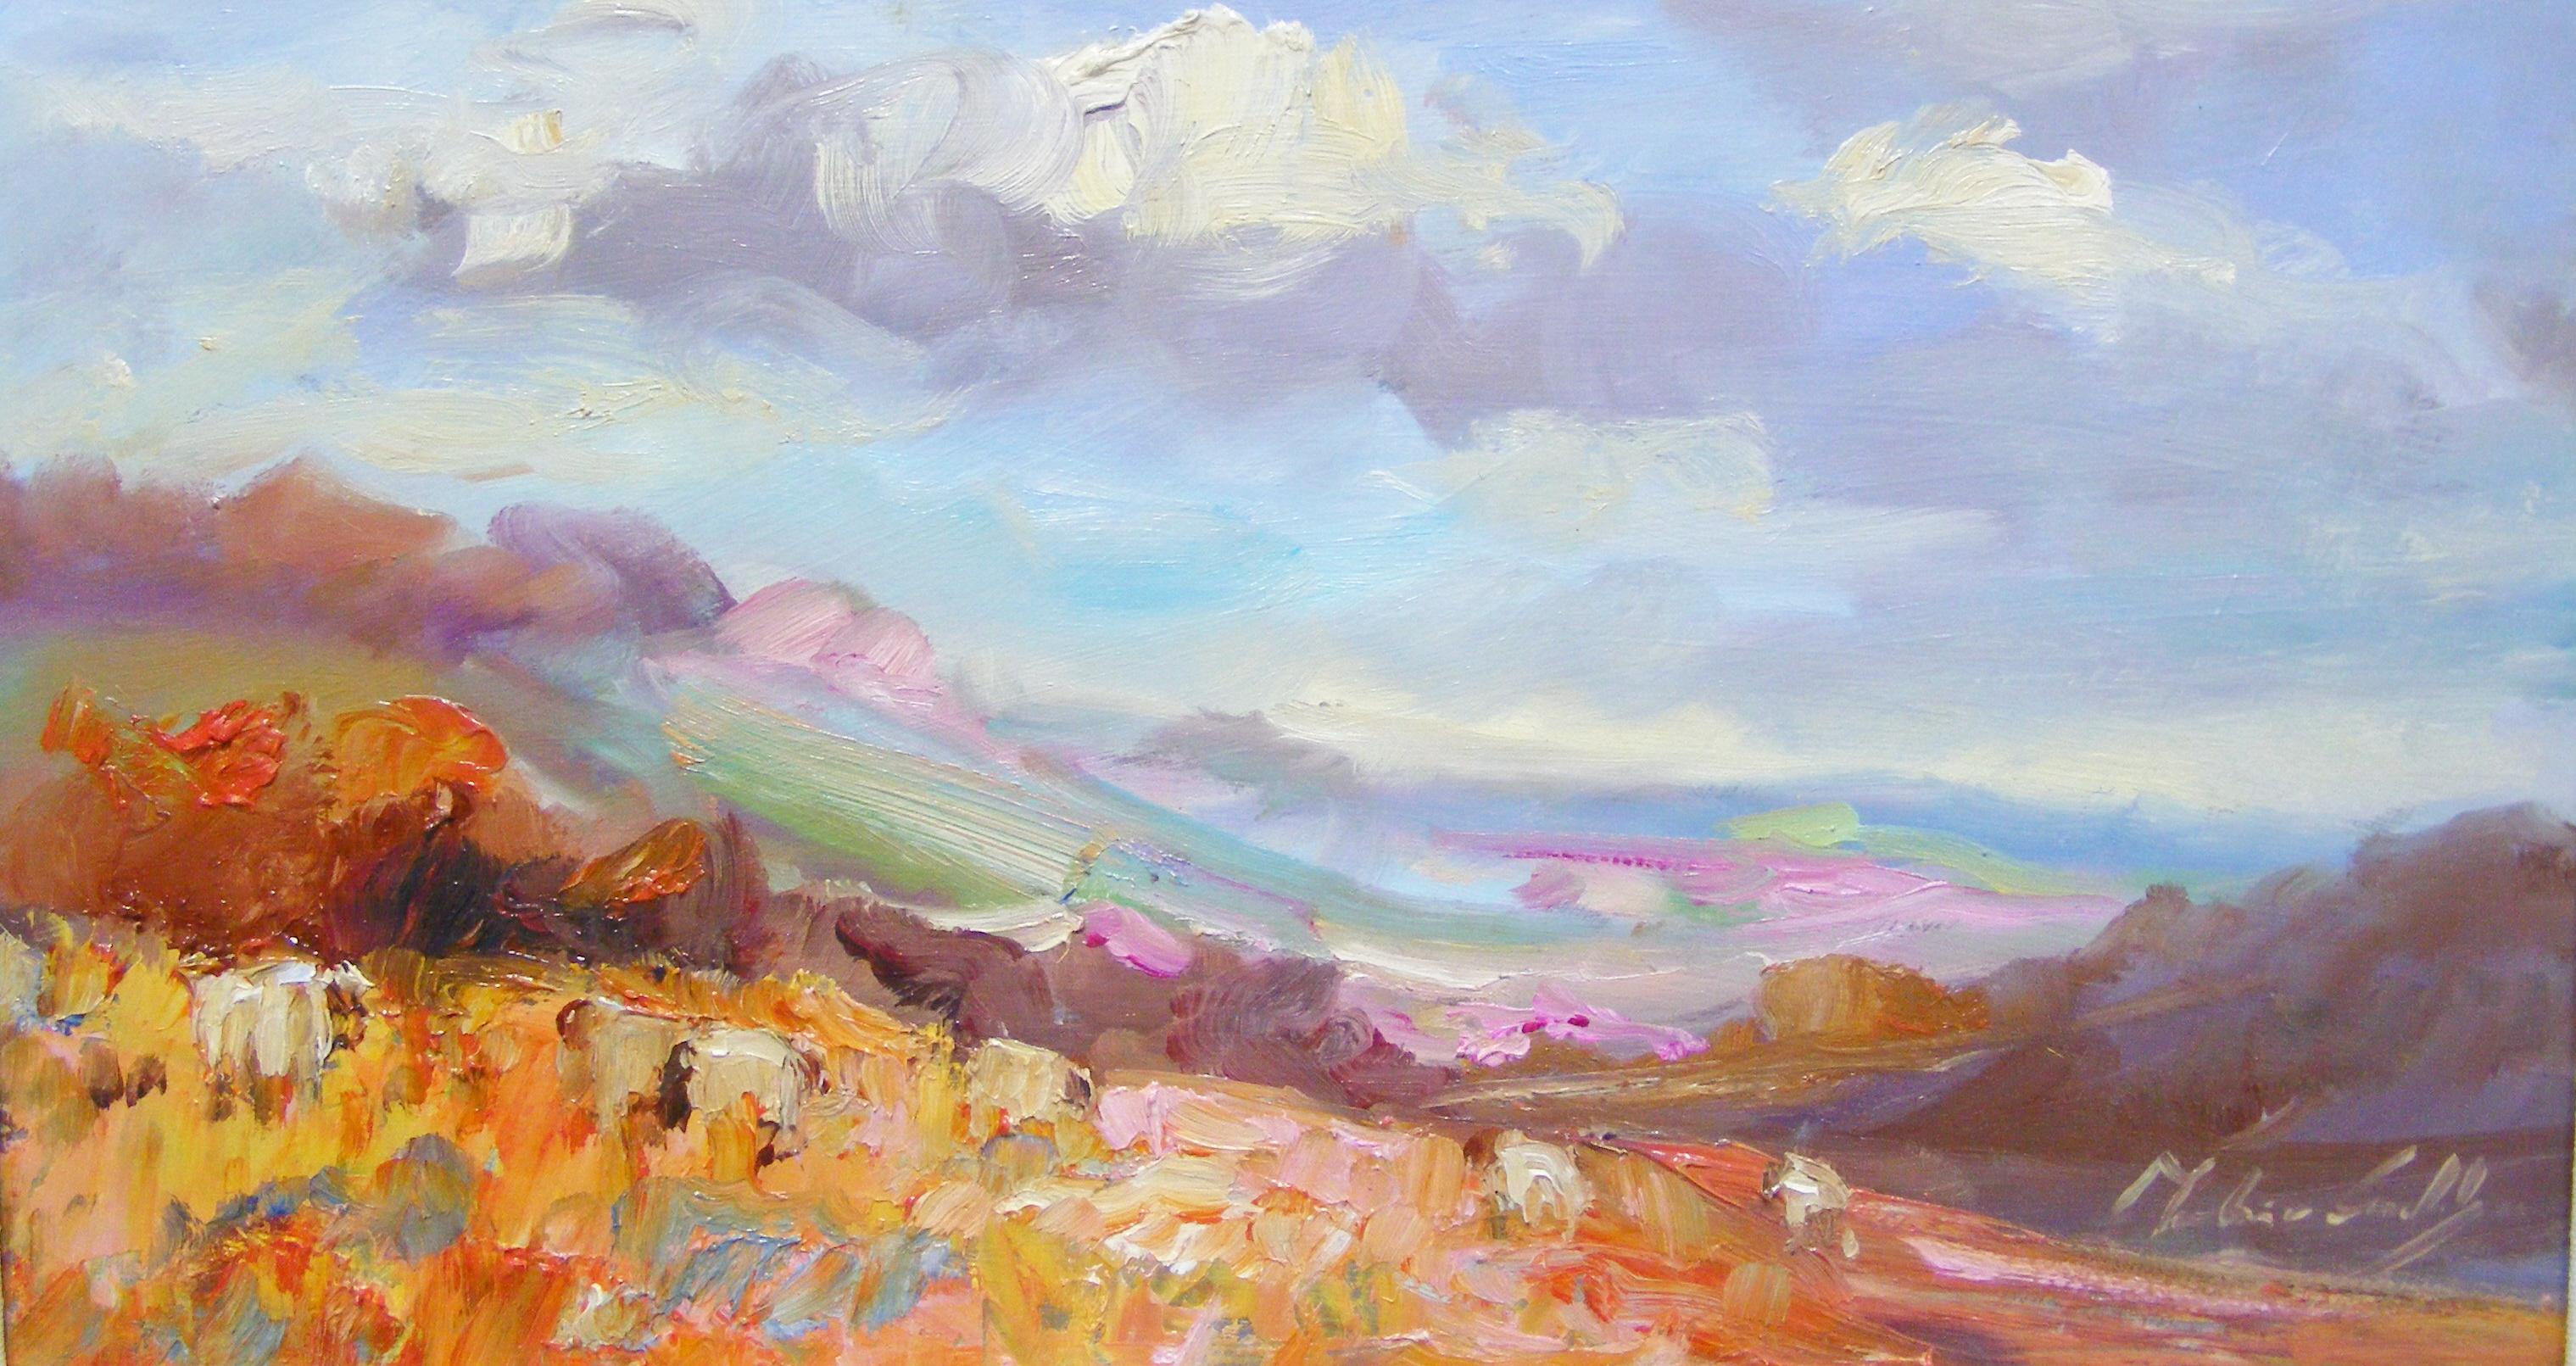 Downland Sheep - £200